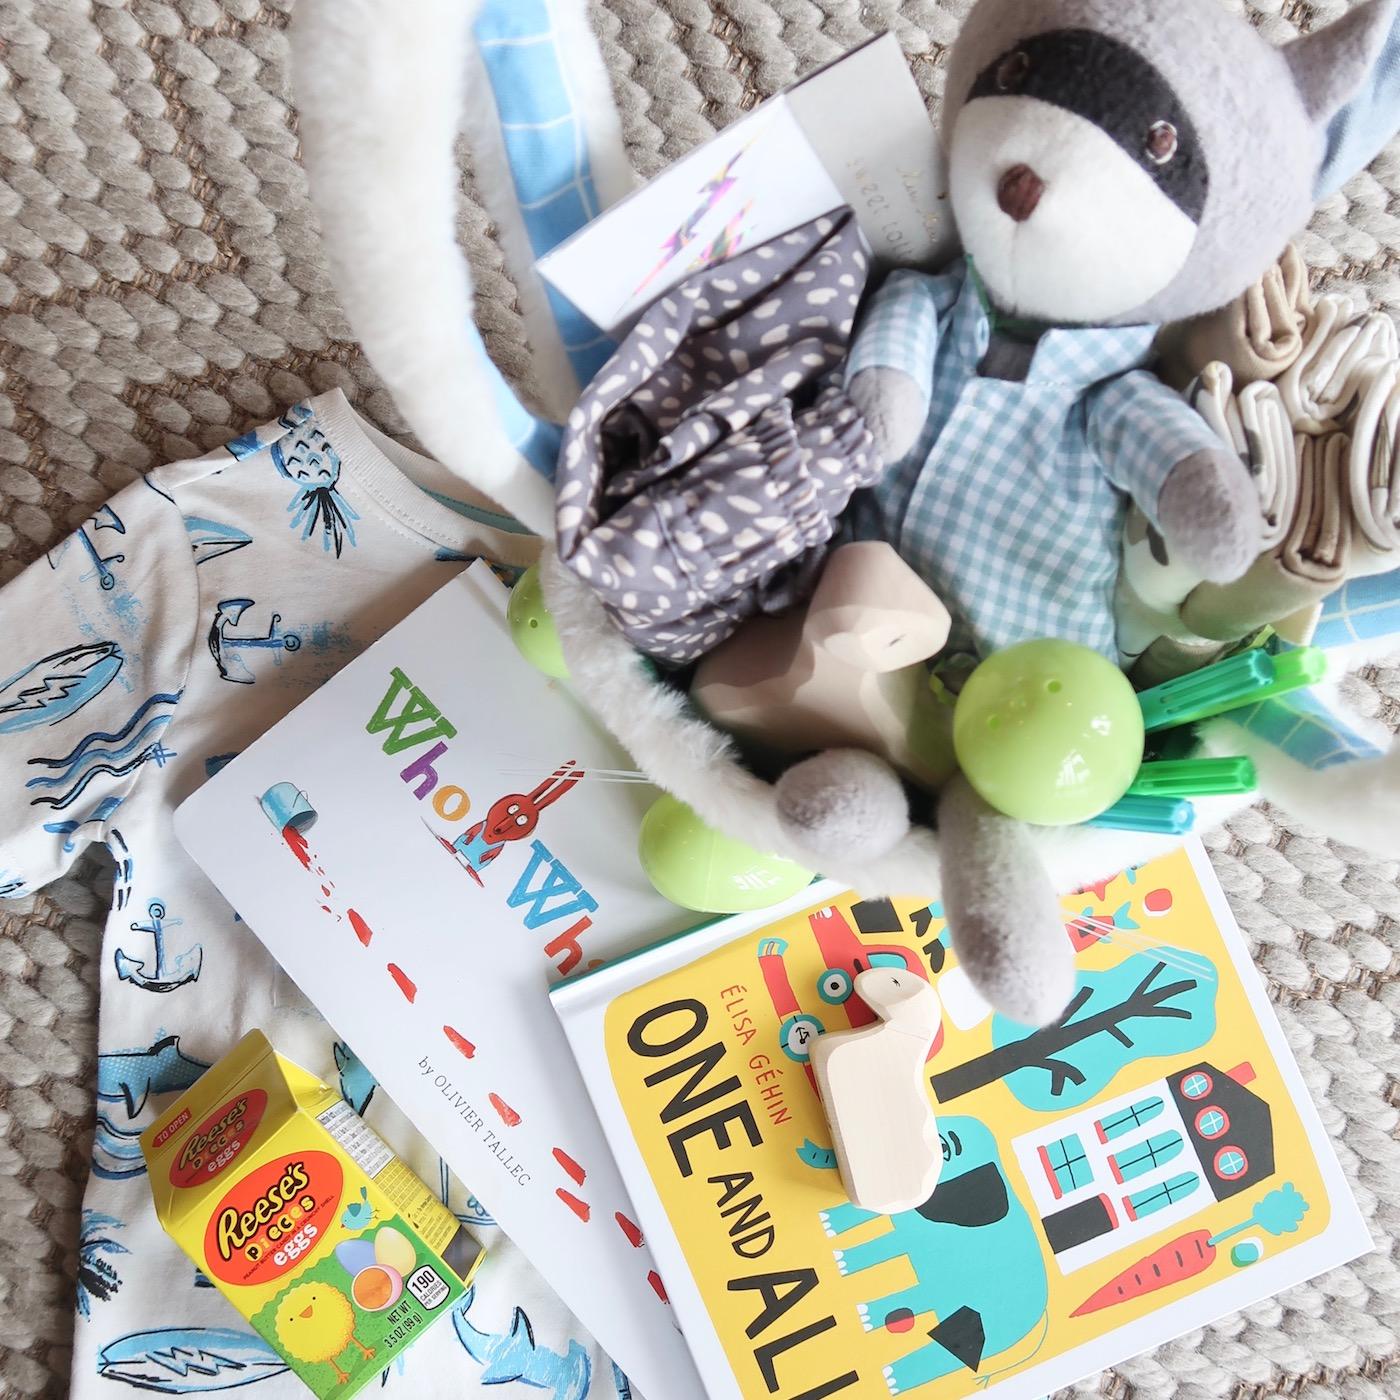 Easter Basket ideas for toddlers // #practical #useful #easterbasket